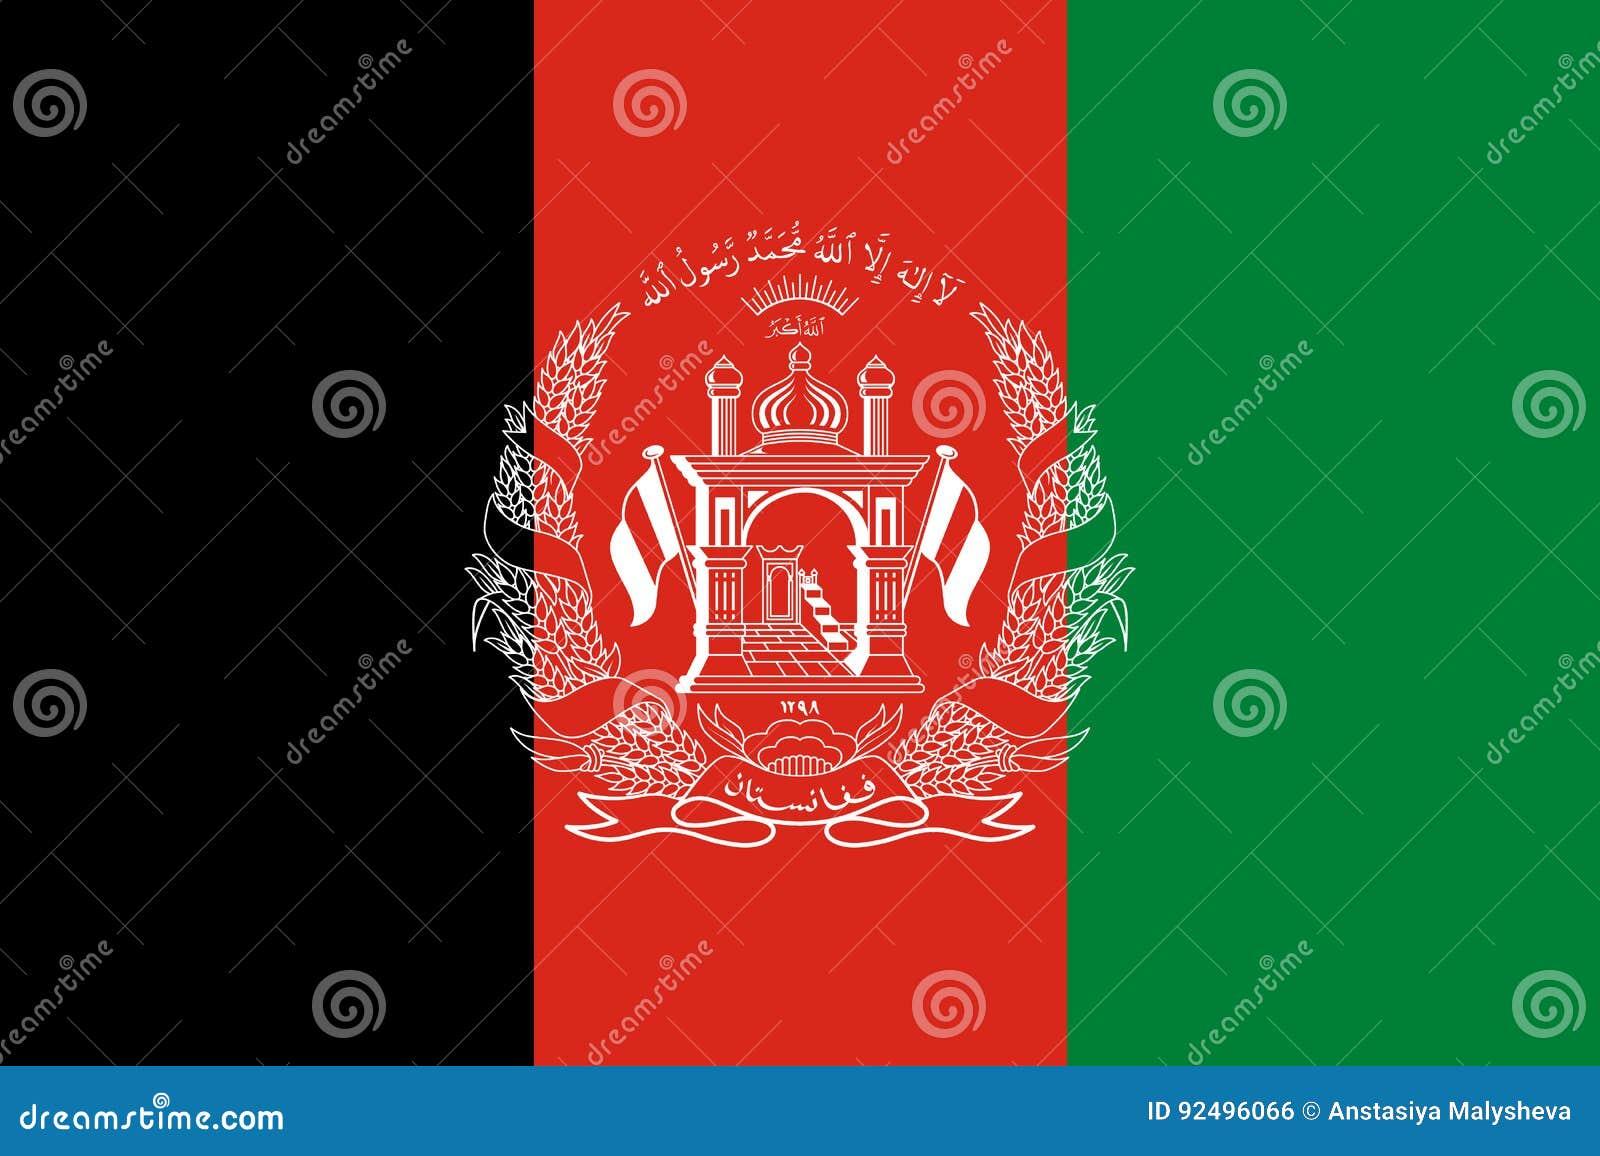 National Flag Of Afghanistan Republic Stock Vector Illustration